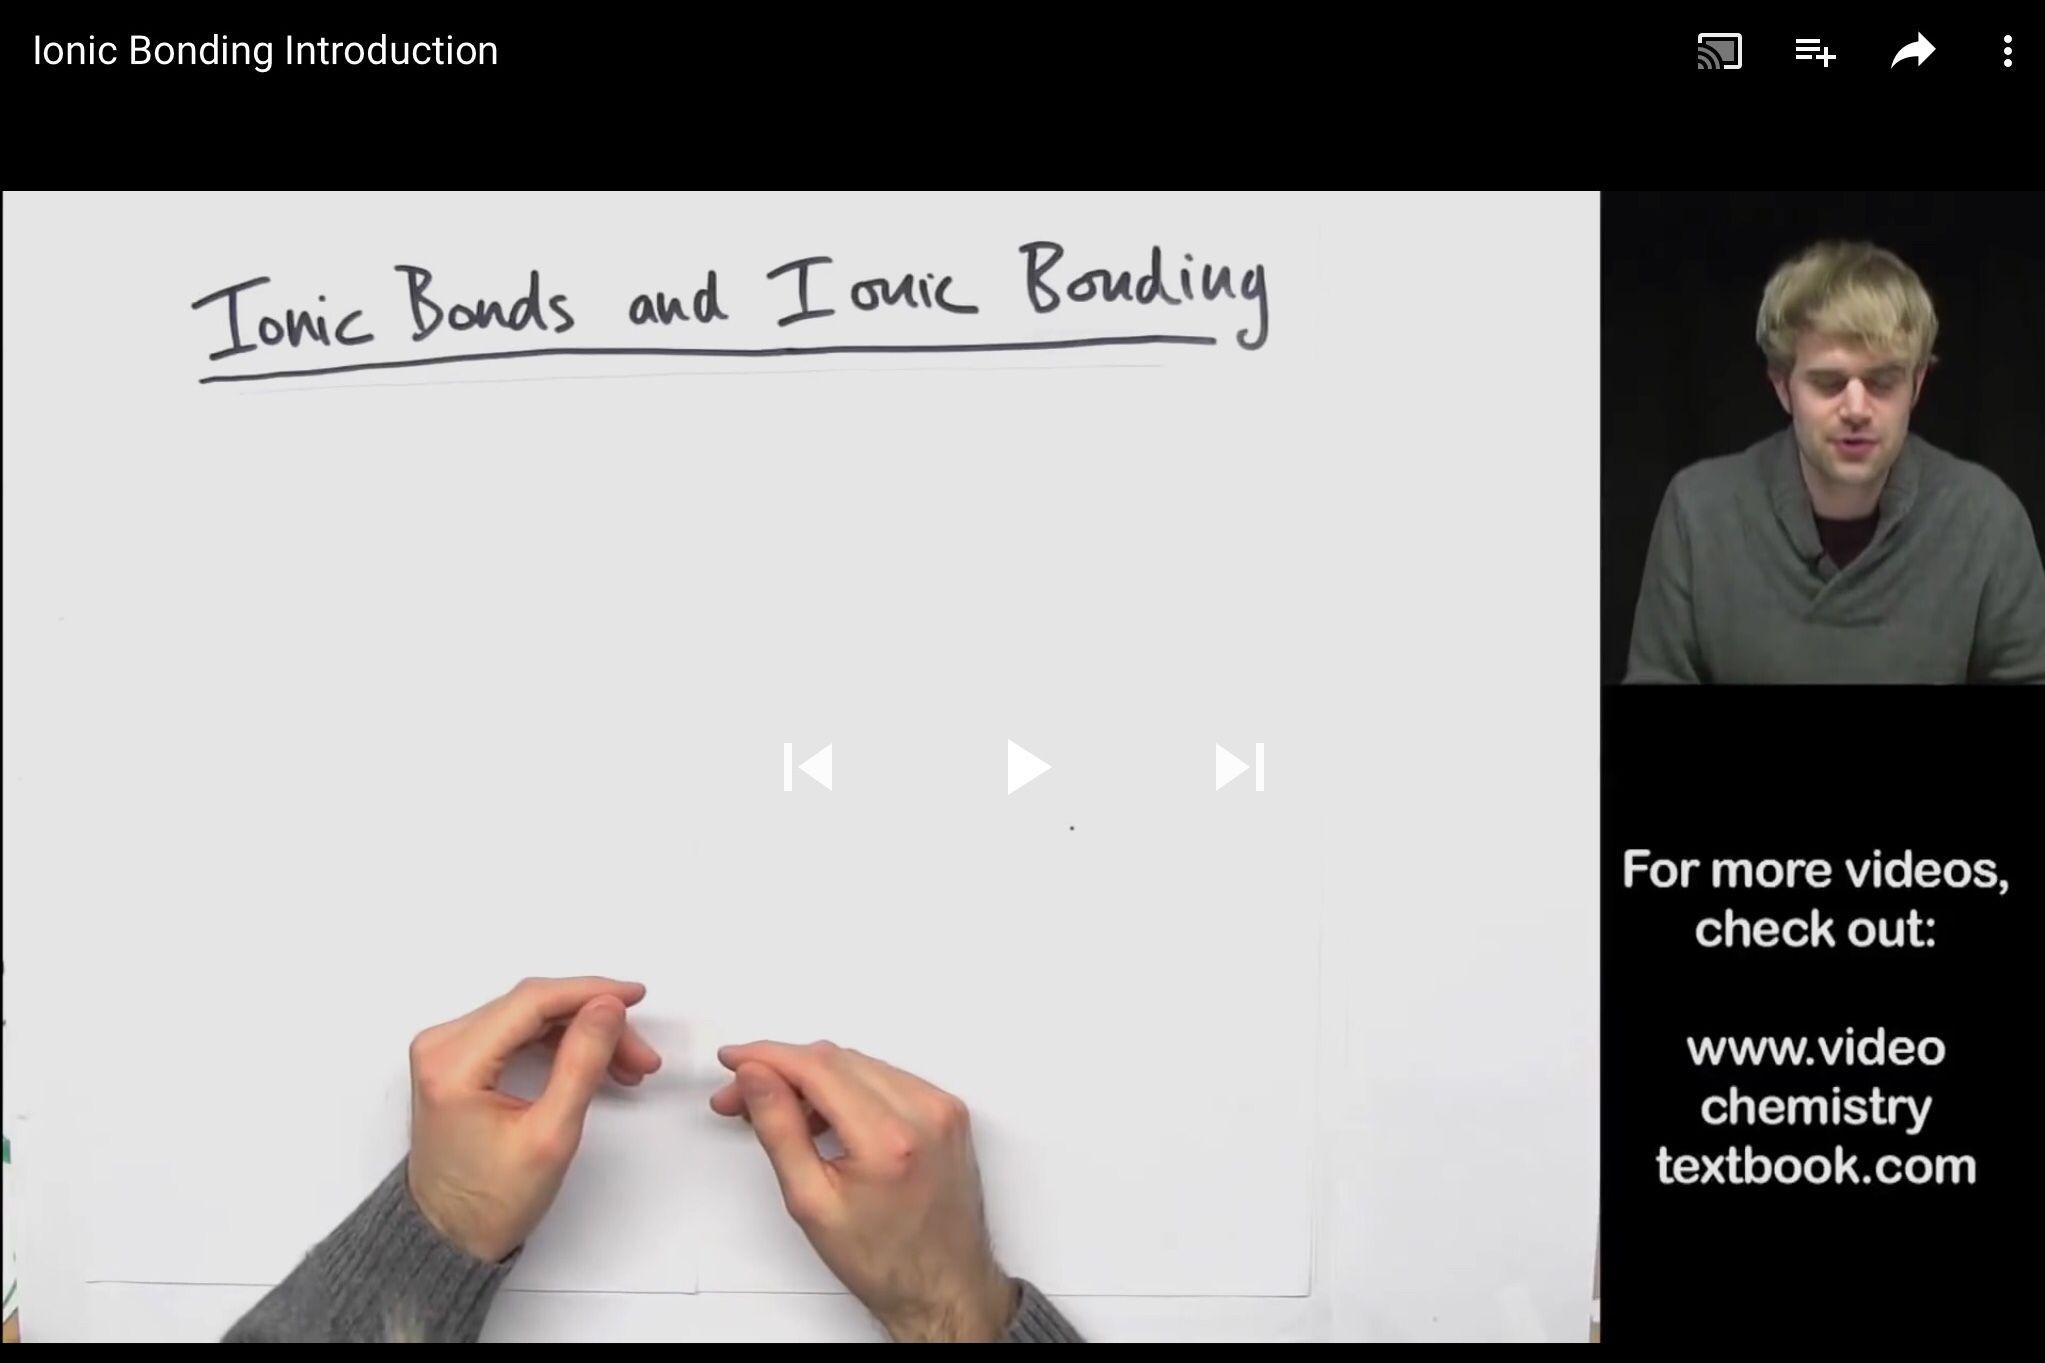 Ionic Bonding Introduction